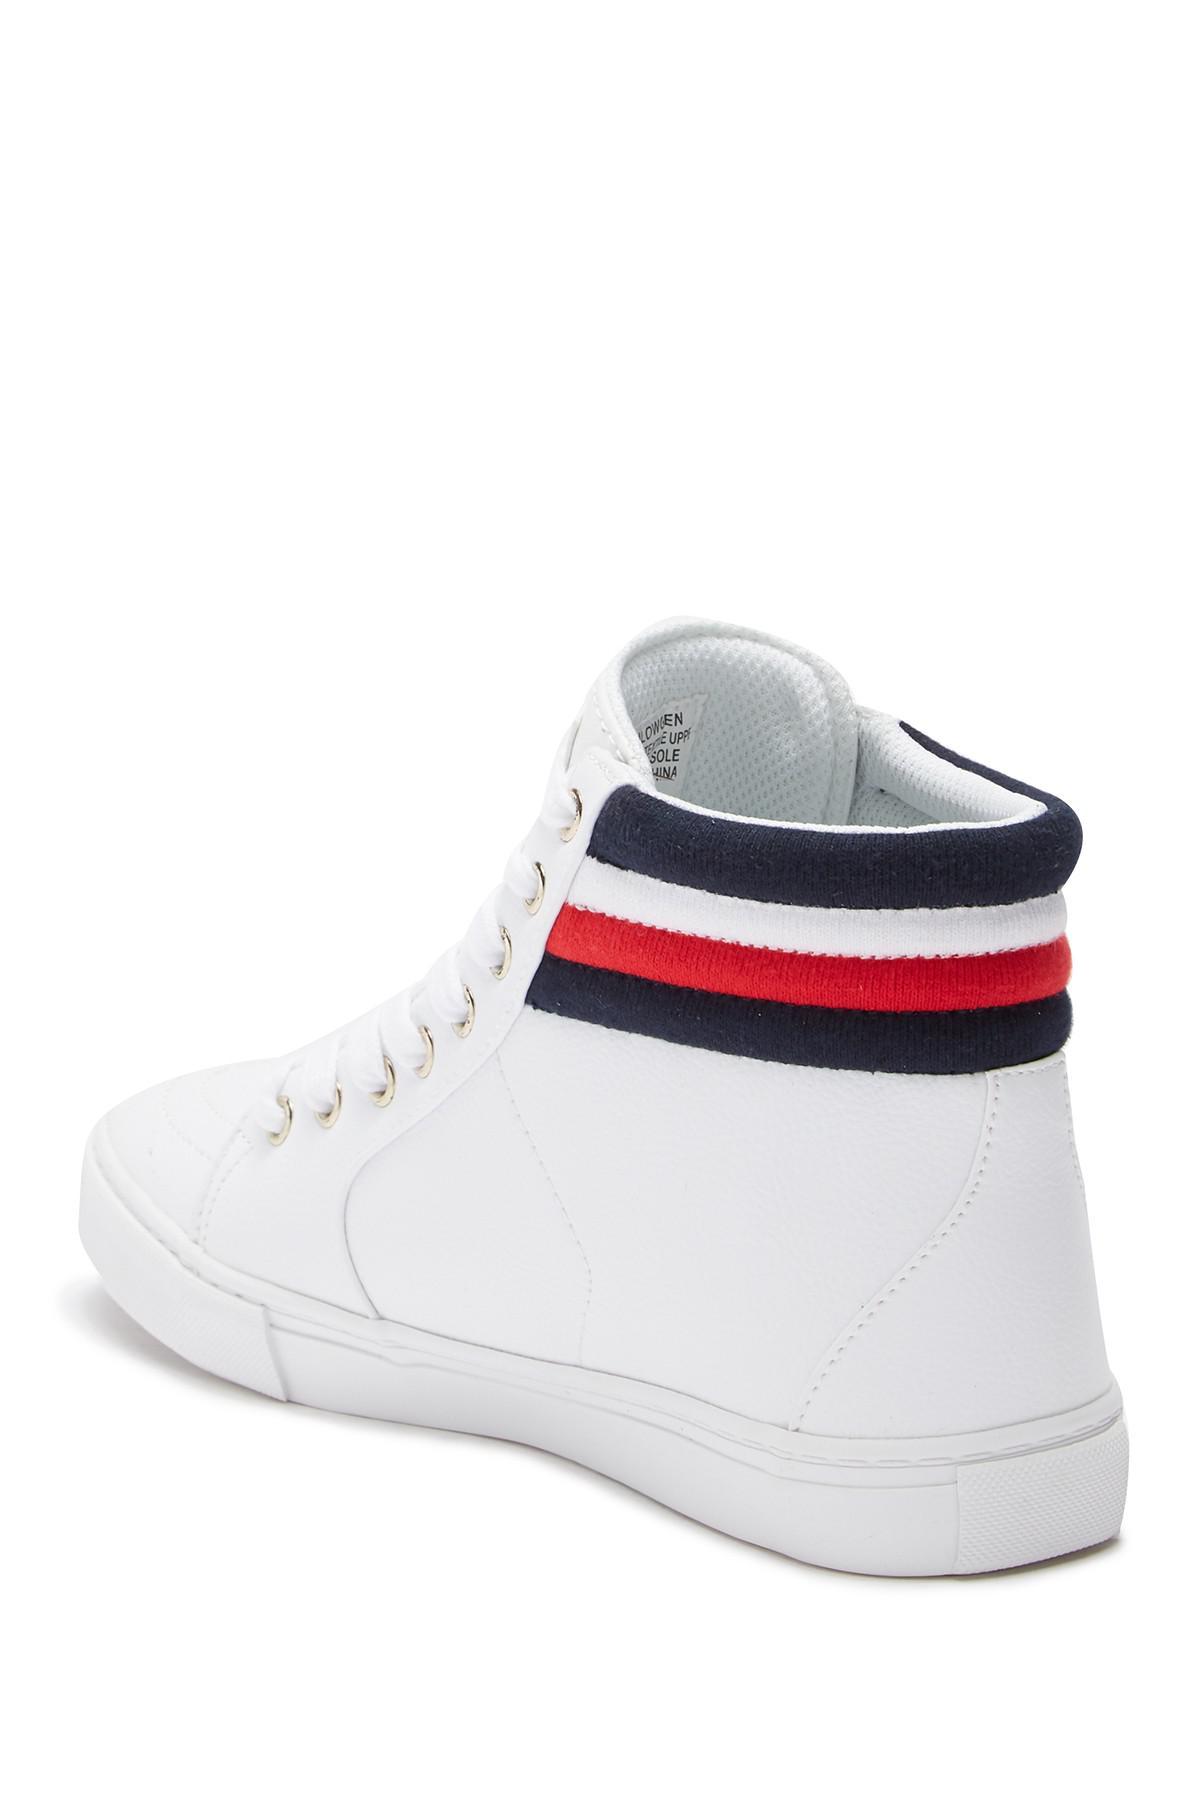 b0703d5a46fb5 Tommy Hilfiger - White Lowgen High Top Sneaker - Lyst. View fullscreen